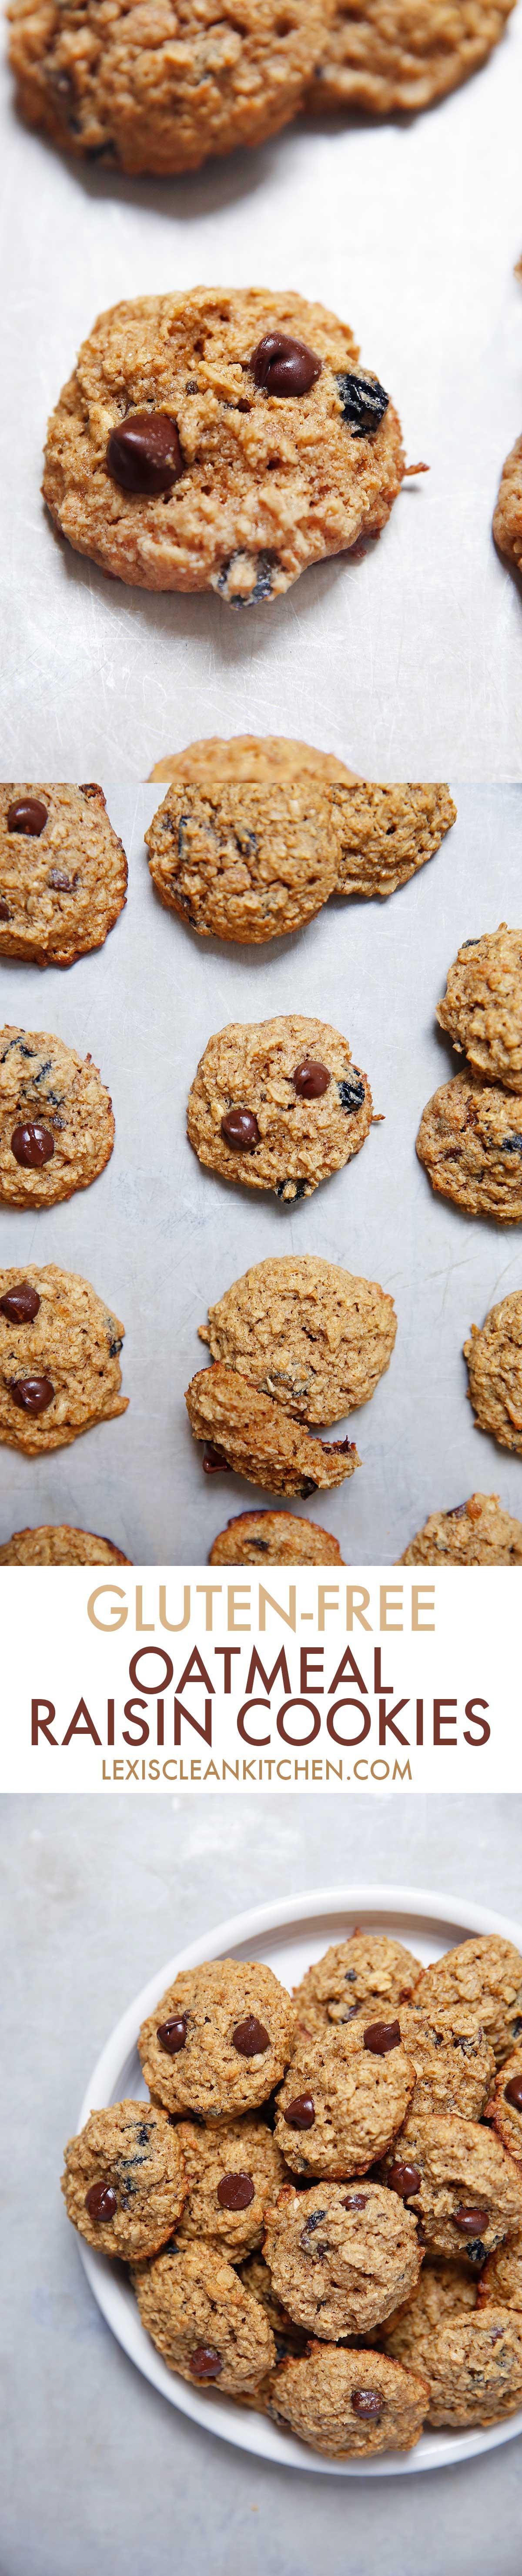 Gluten Free Oatmeal Raisin Cookies (Gluten-free, refined sugar-free}   Lexi's Clean Kitchen